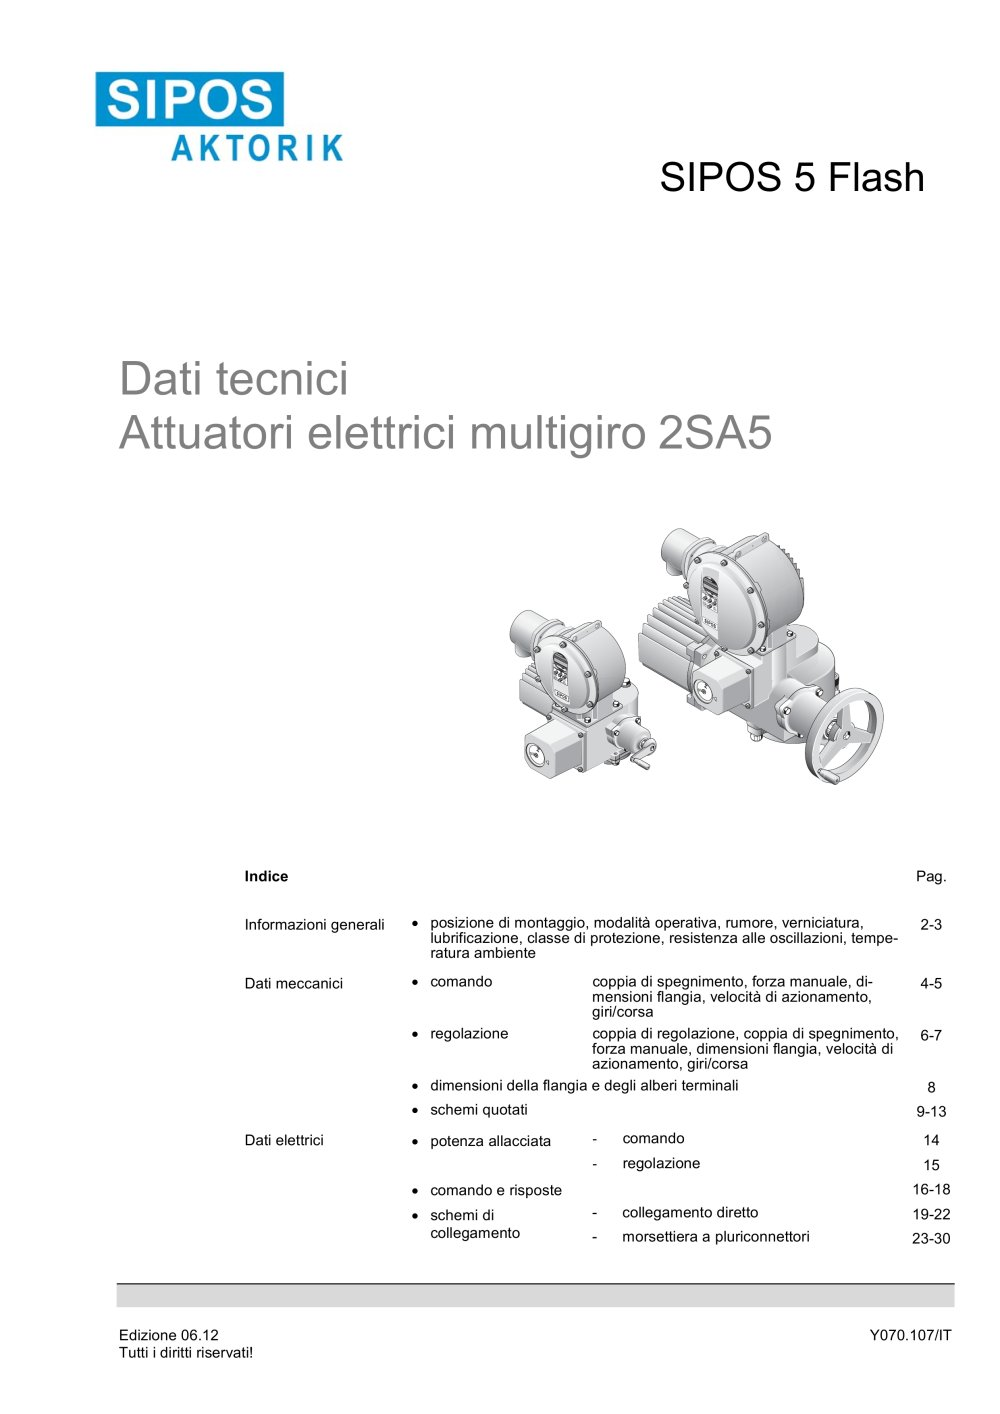 Schemi Elettrici Pdf : Dati tecnici attuatori elettrici multigiro sa sipos aktorik